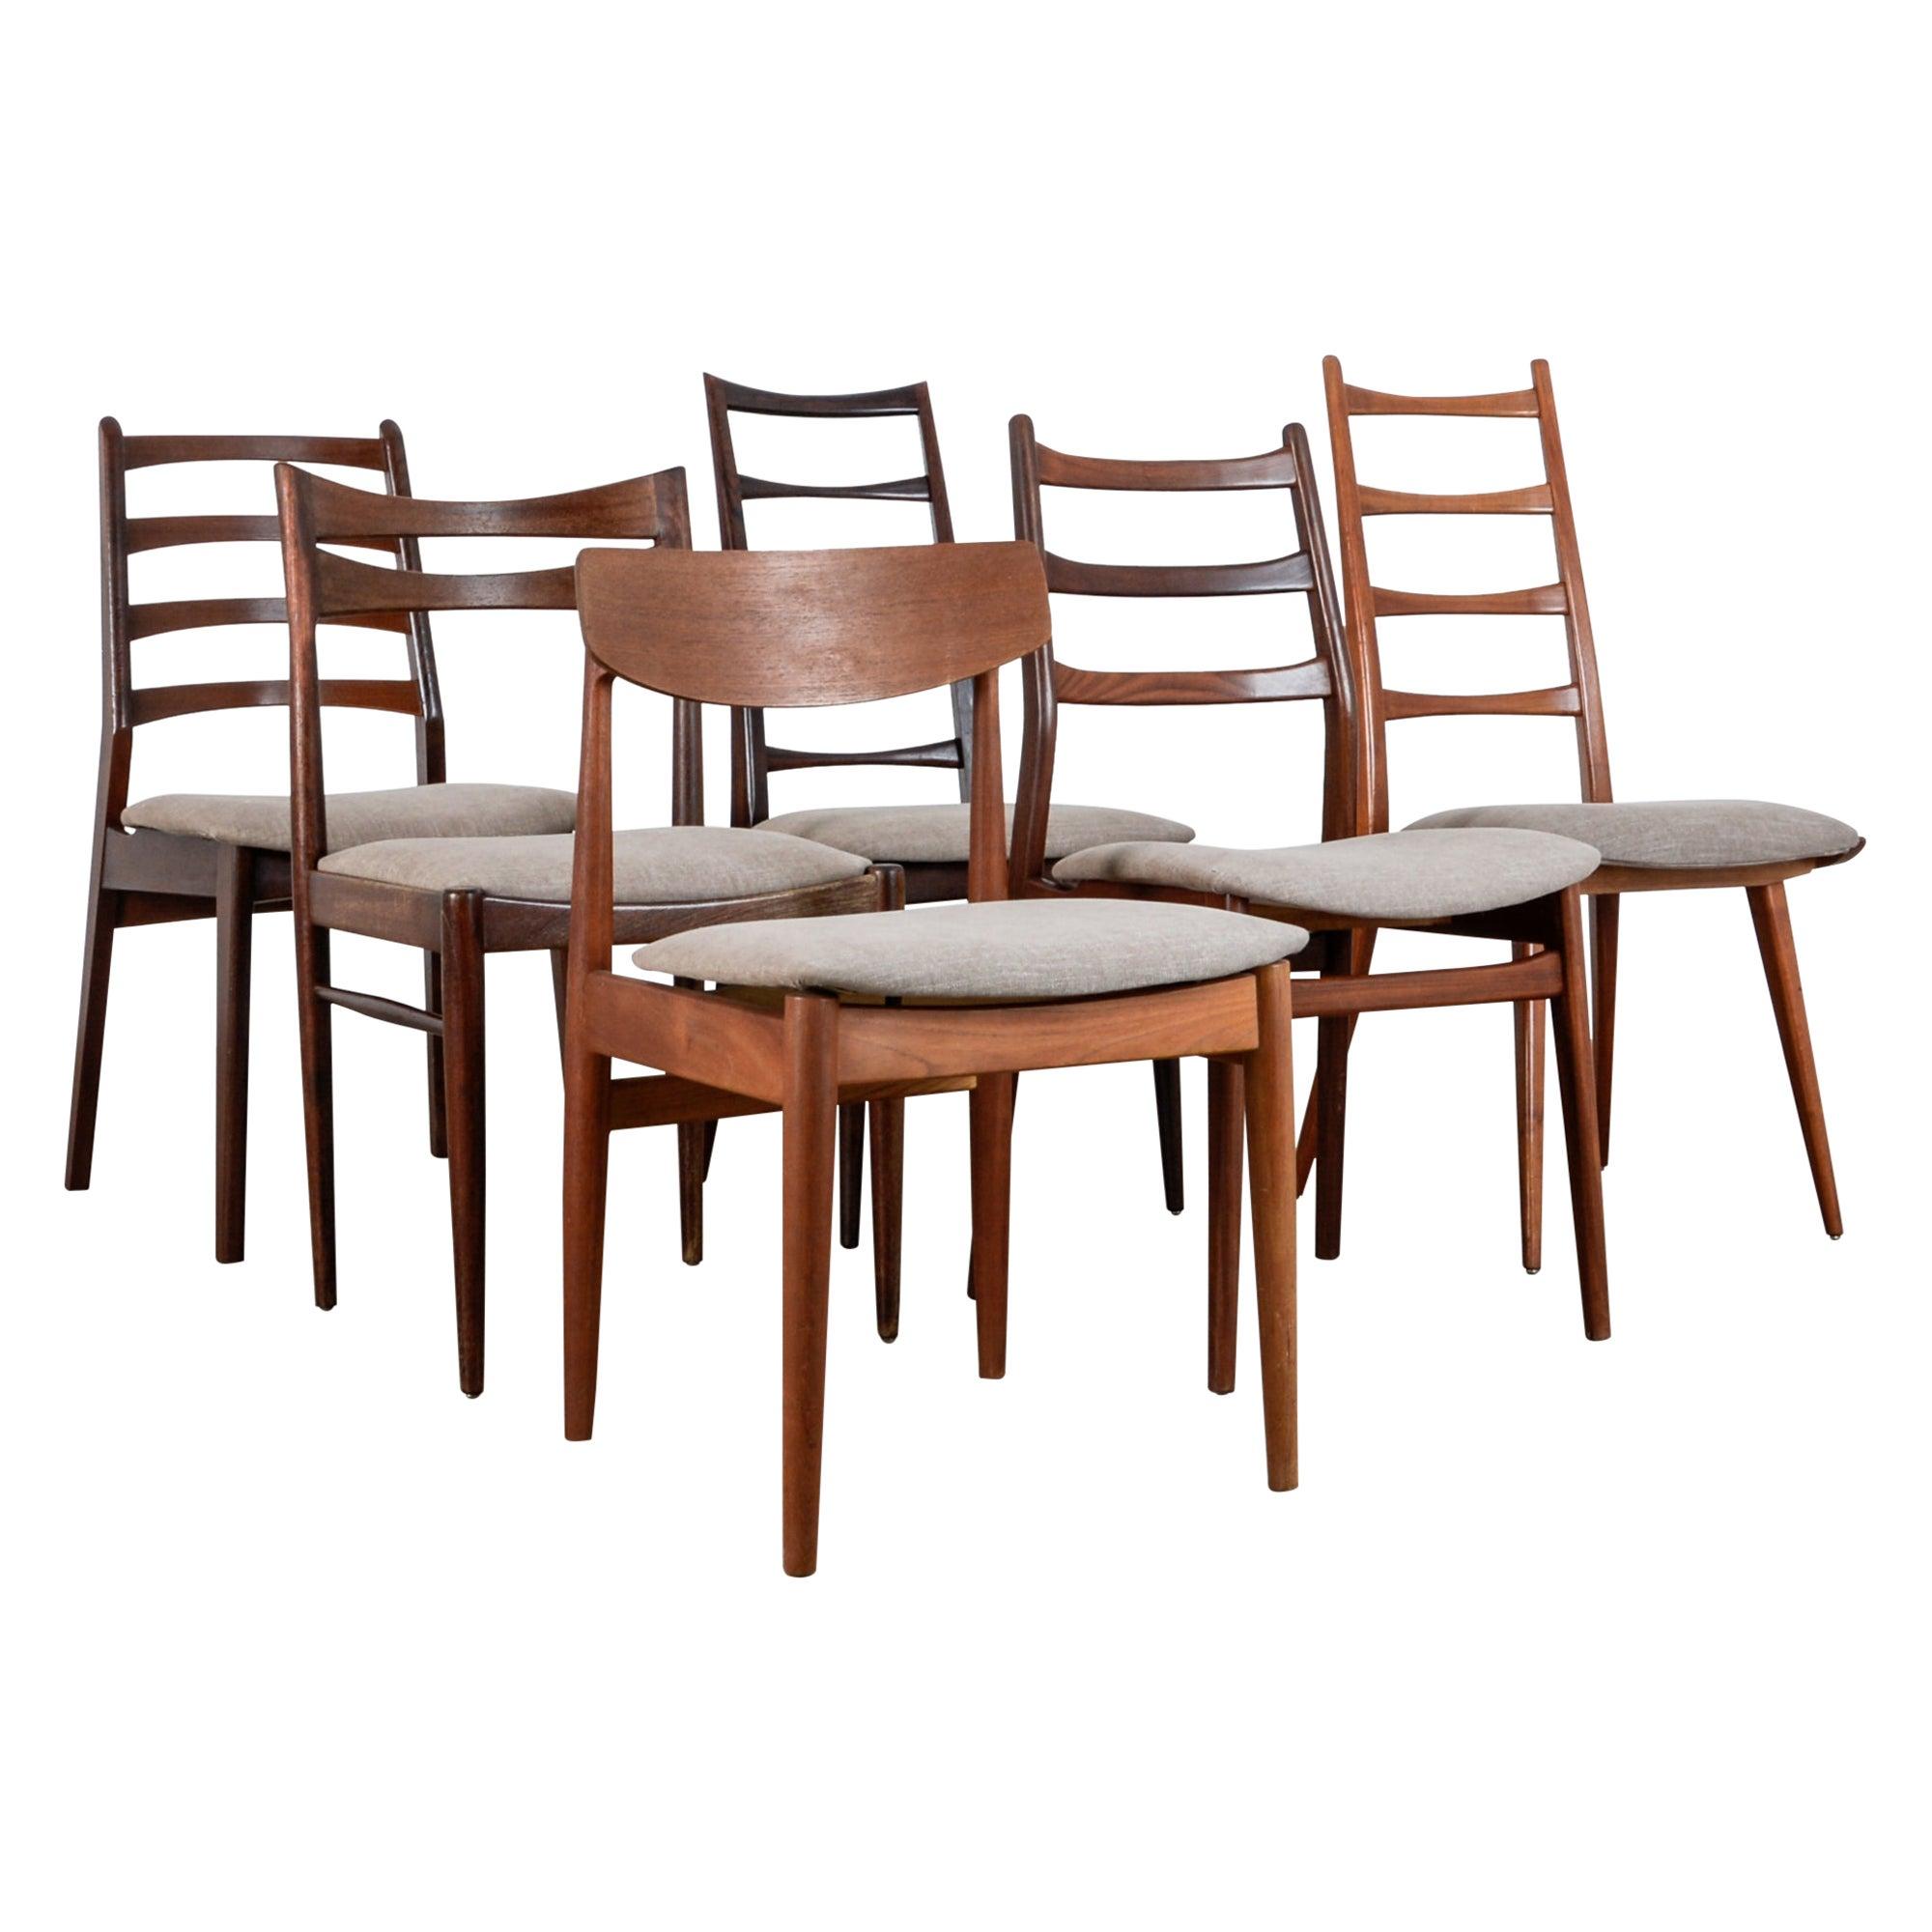 Danish Modern Mixed Dining Chairs, Set of Six